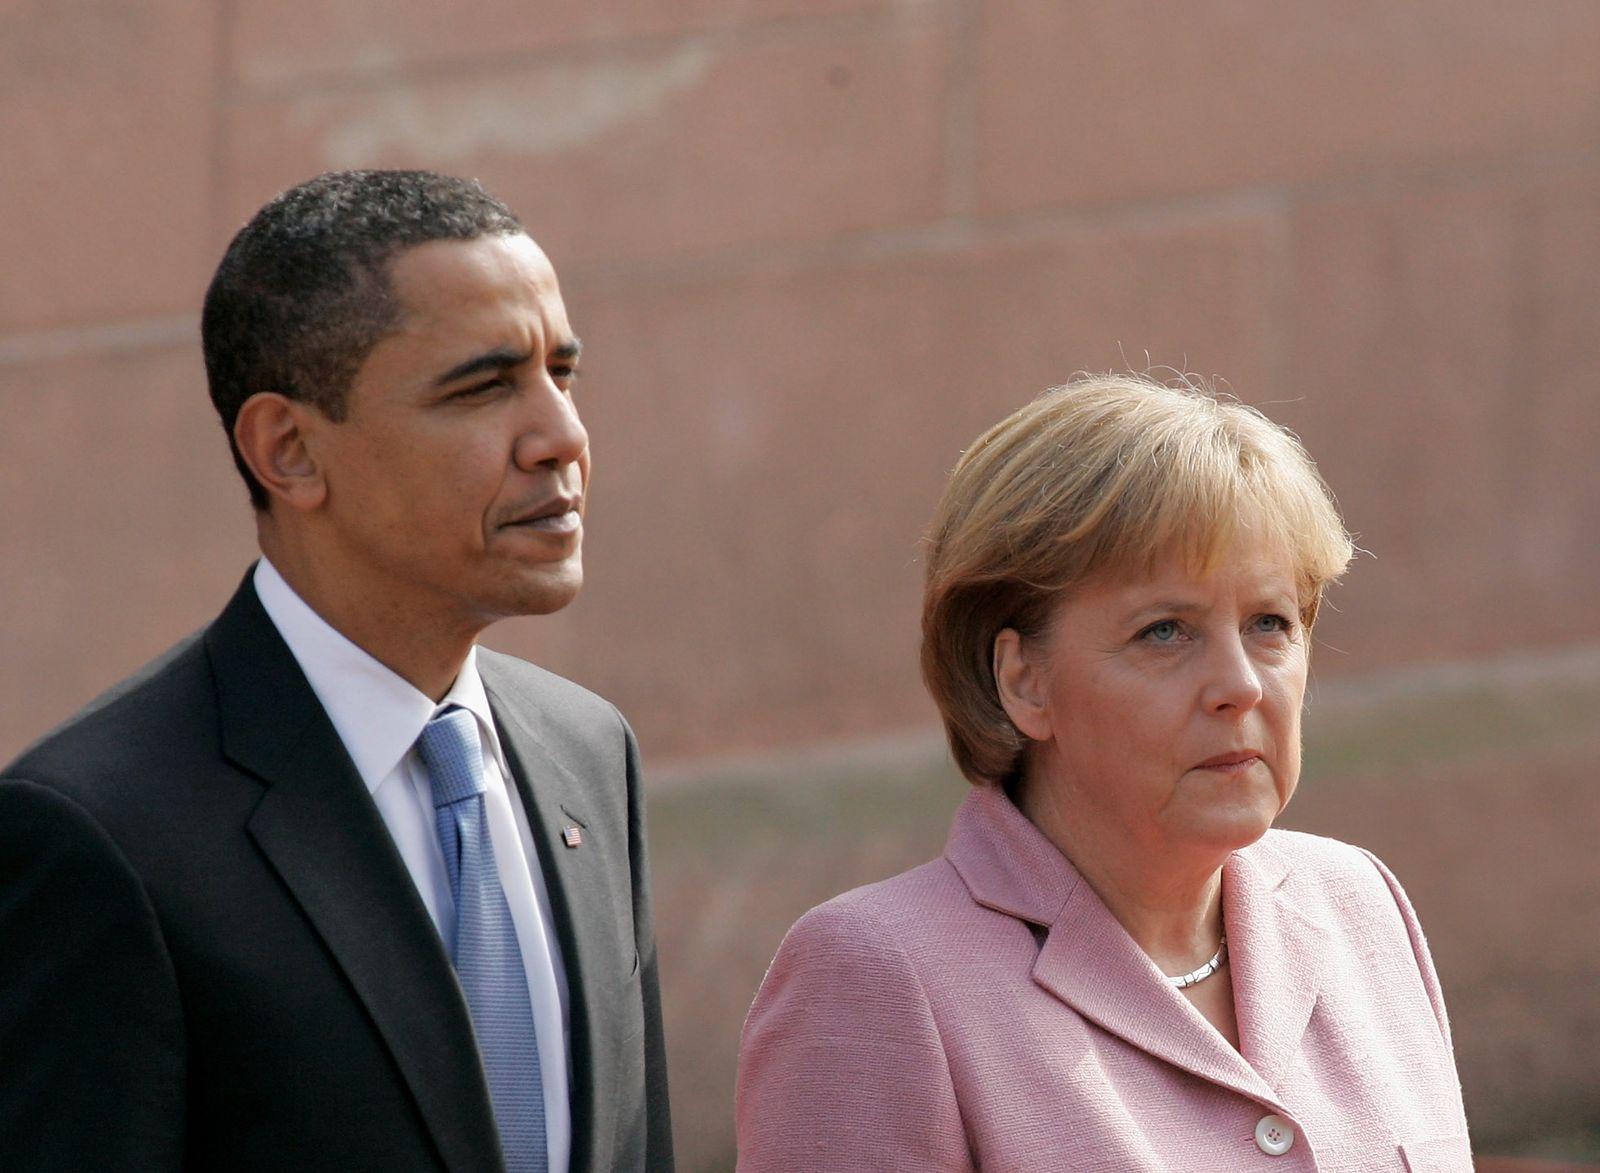 Barack Obama / Angela Merkel (2009)